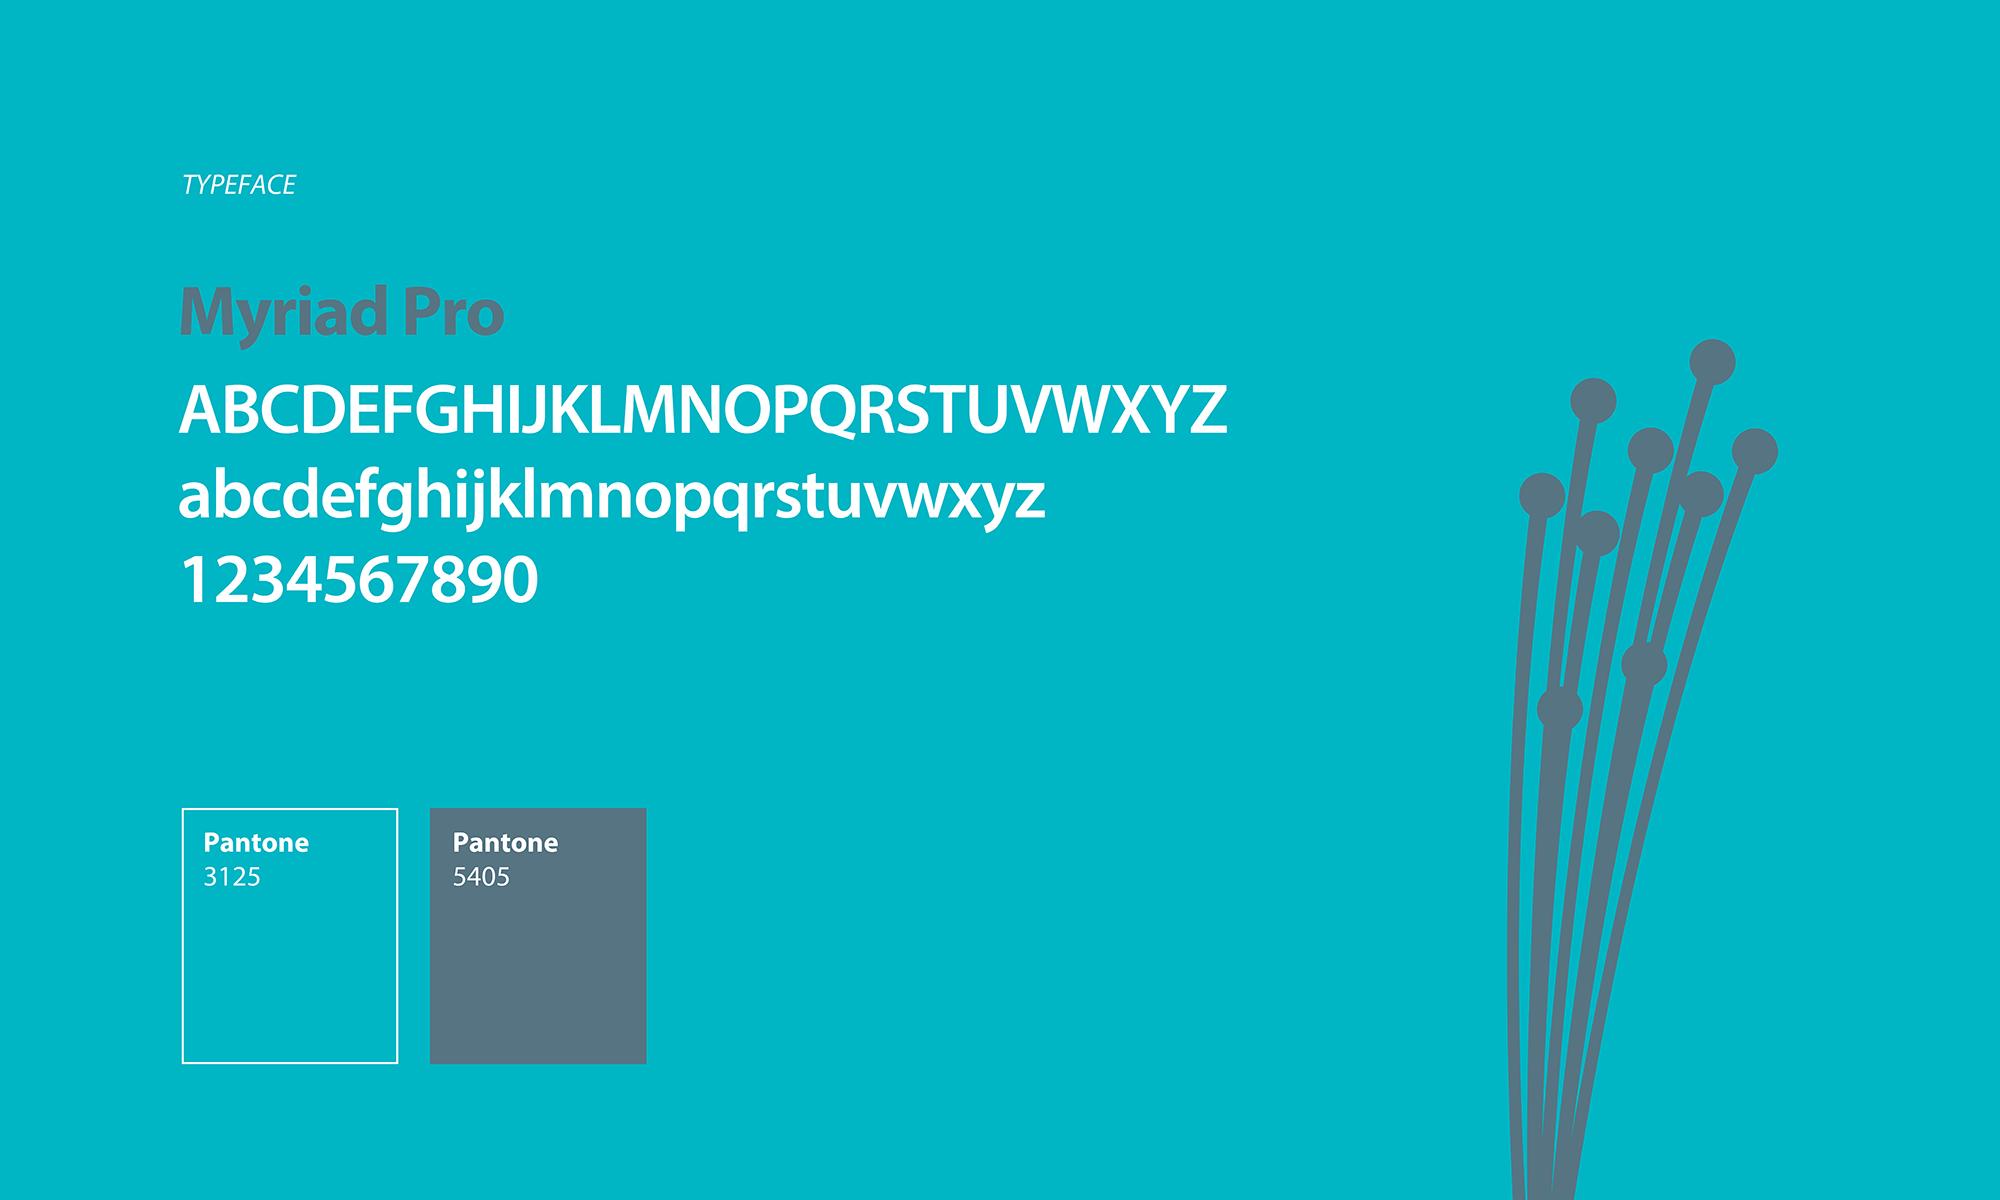 interface-typefacestyle